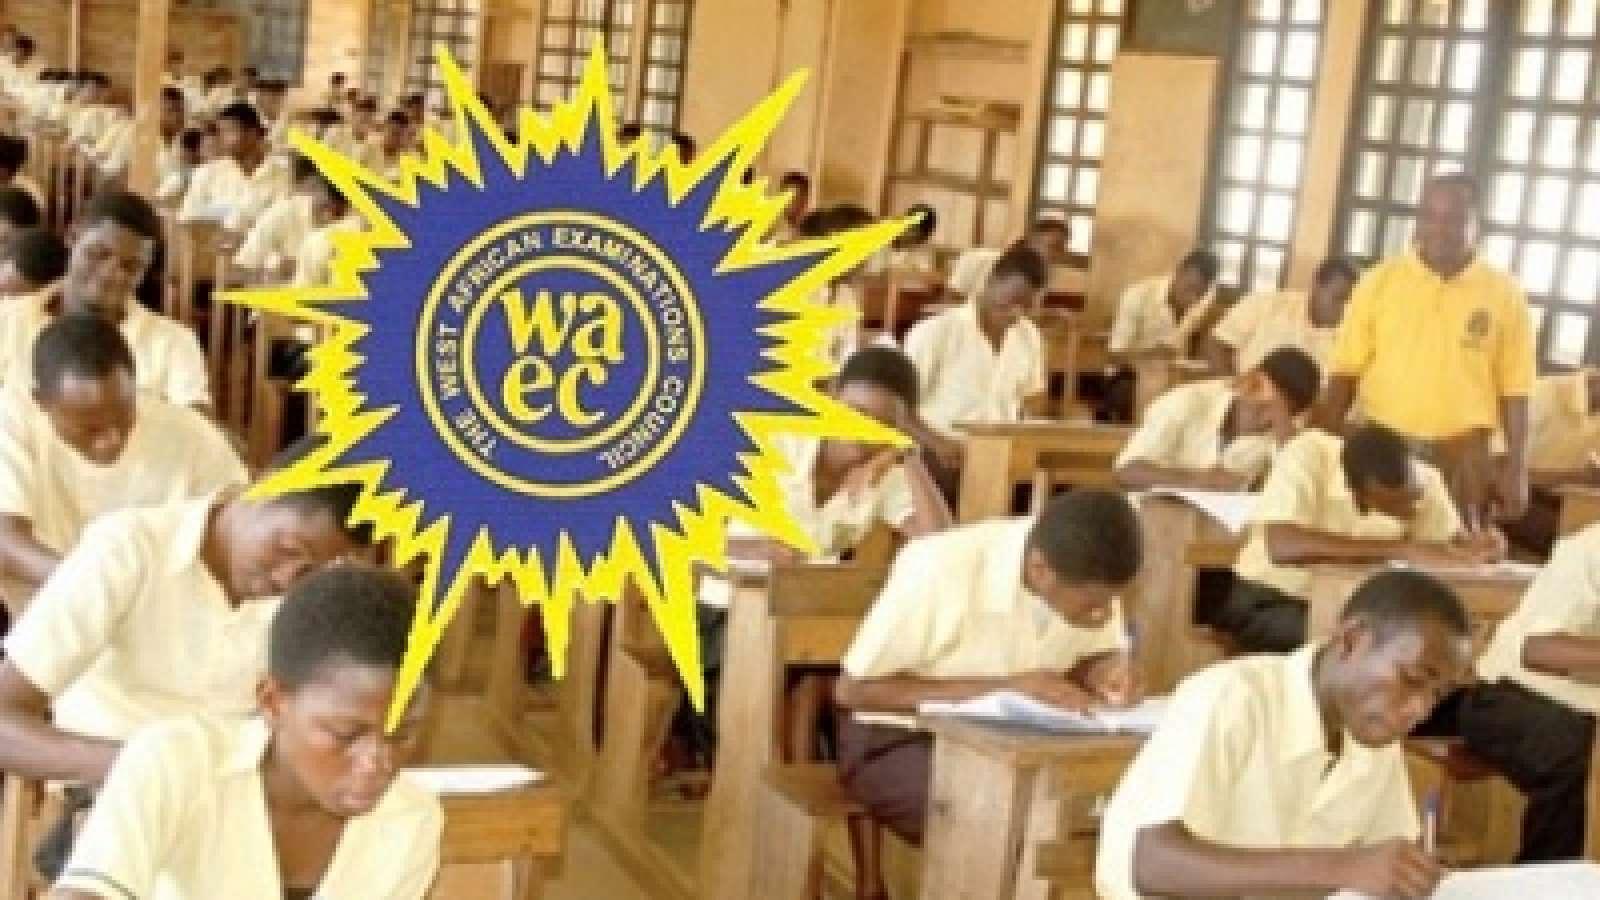 WAEC Limits Exam Towns For WASSCE Second Series